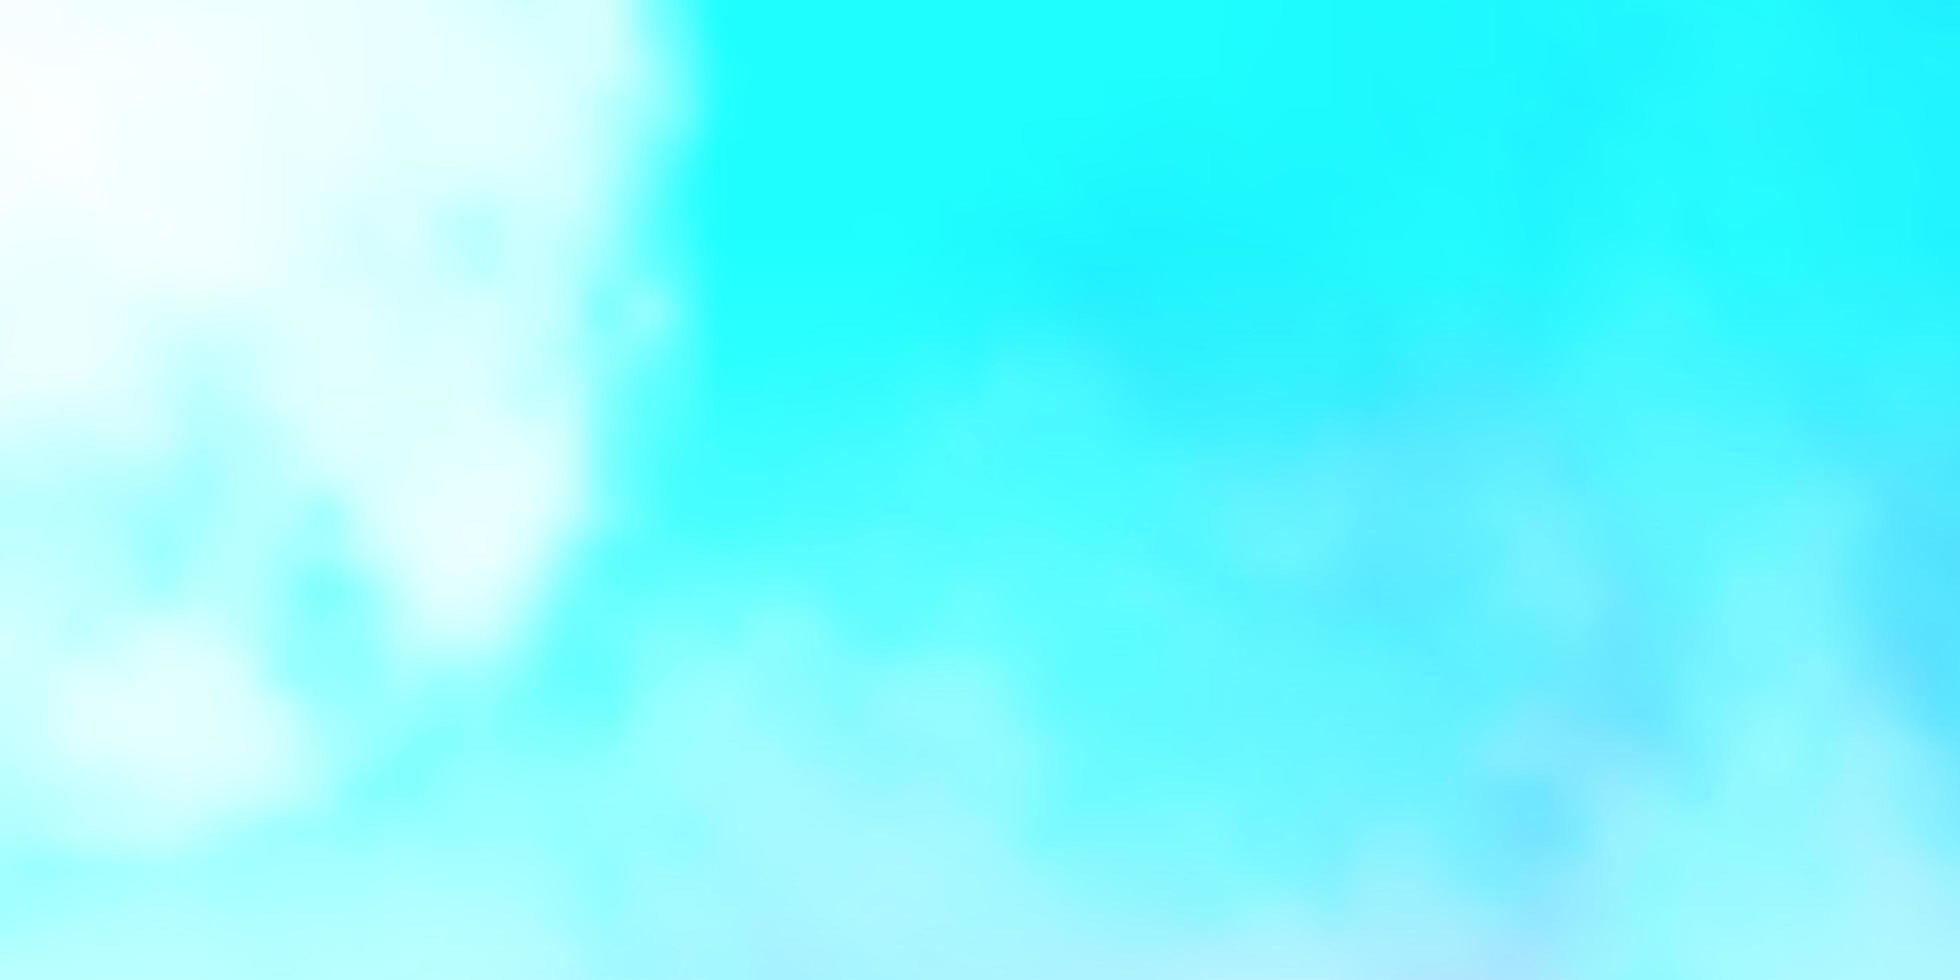 textura de vector azul claro con cielo nublado.